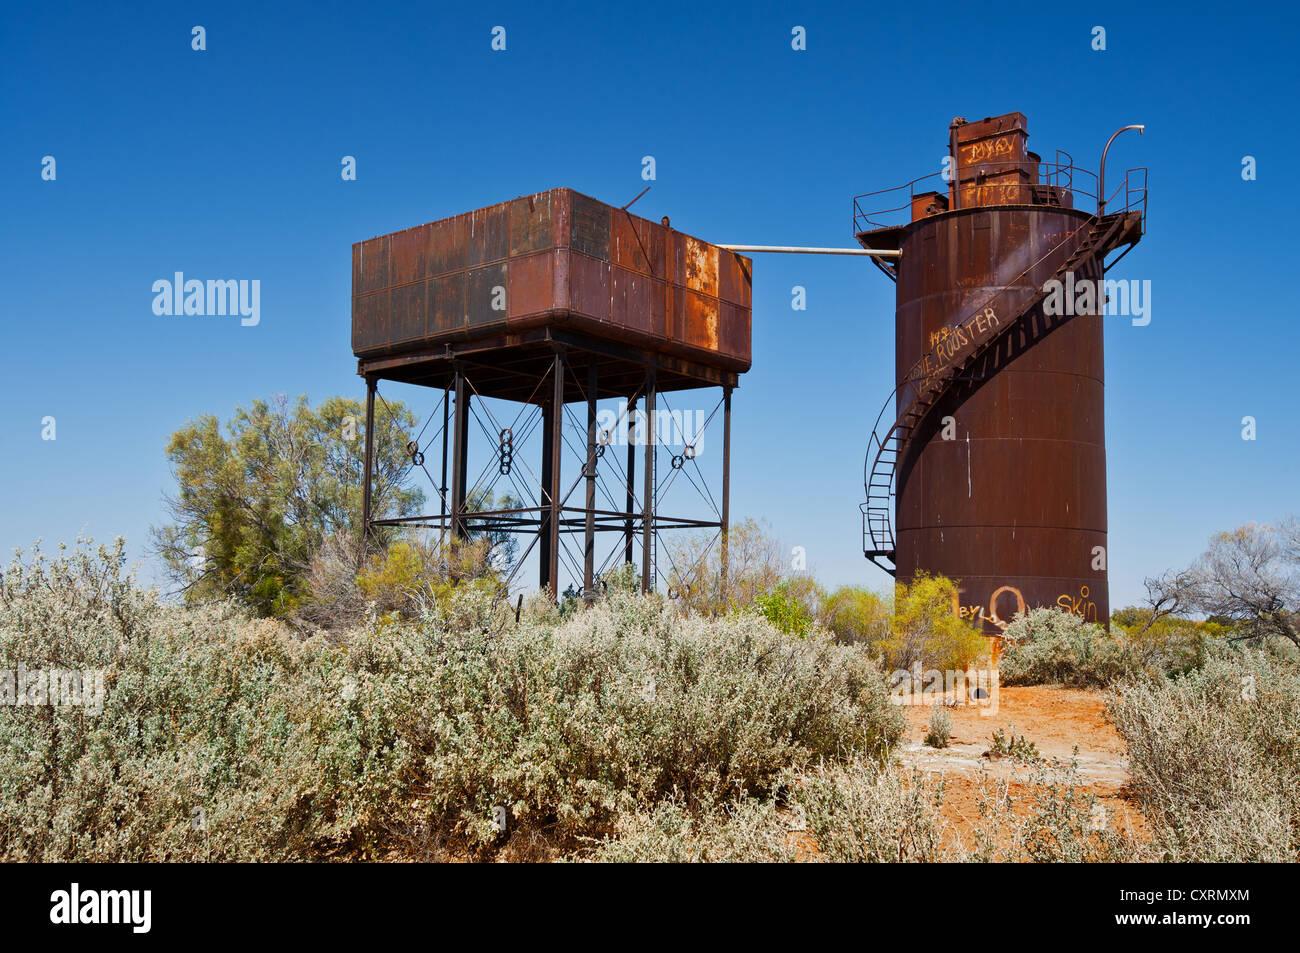 Rusty water tank of Edward Creek Siding Stock Photo: 50923116 - Alamy